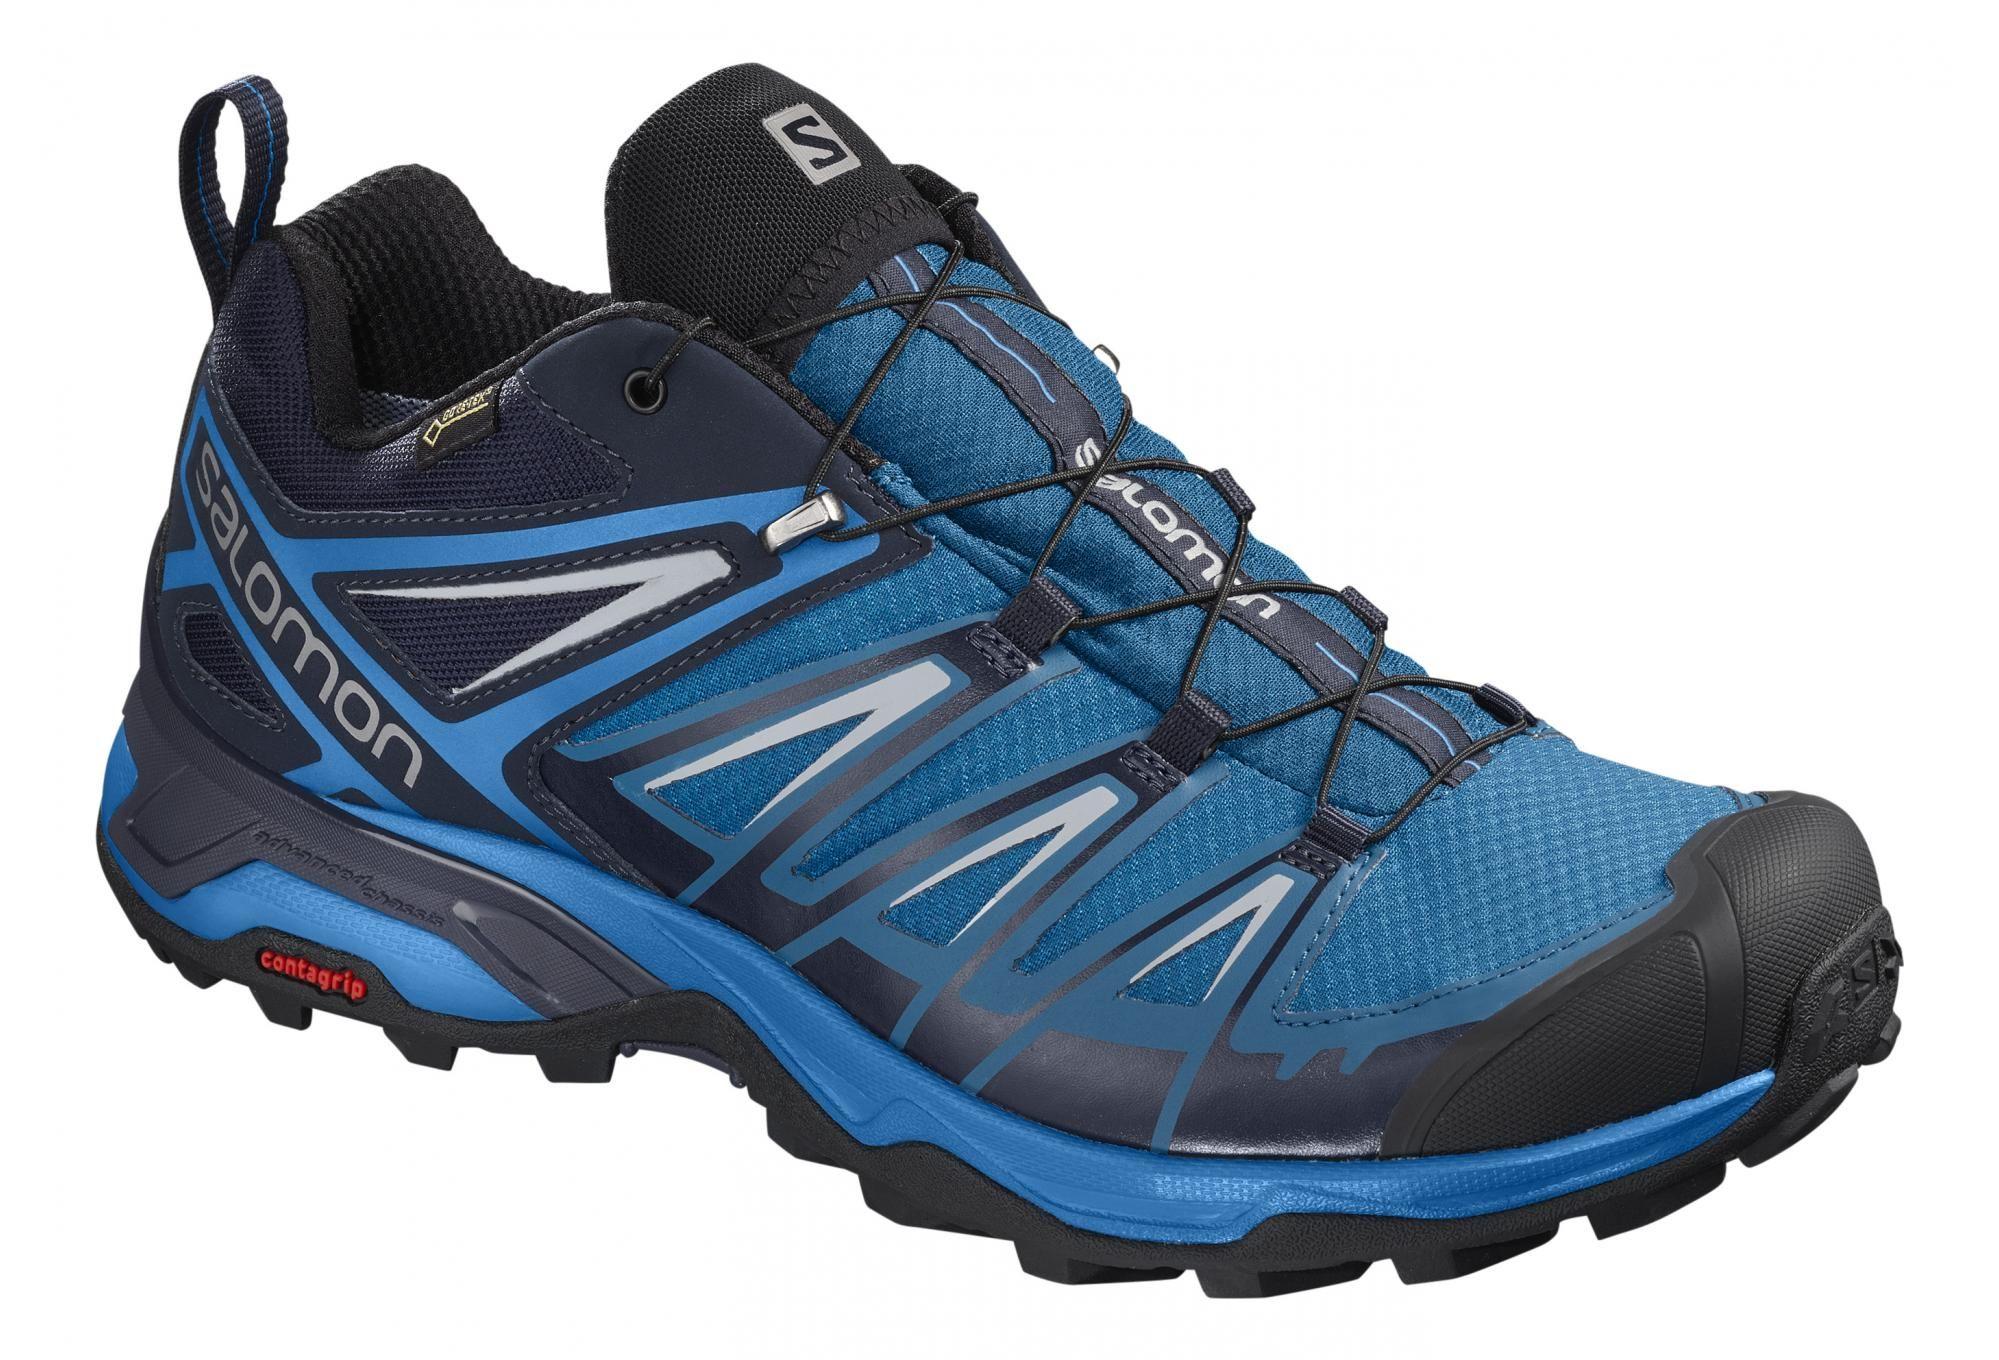 Randonnée X Gtx Chaussures 3 BleuHike Ultra De Hiking Salomon bf6yY7g